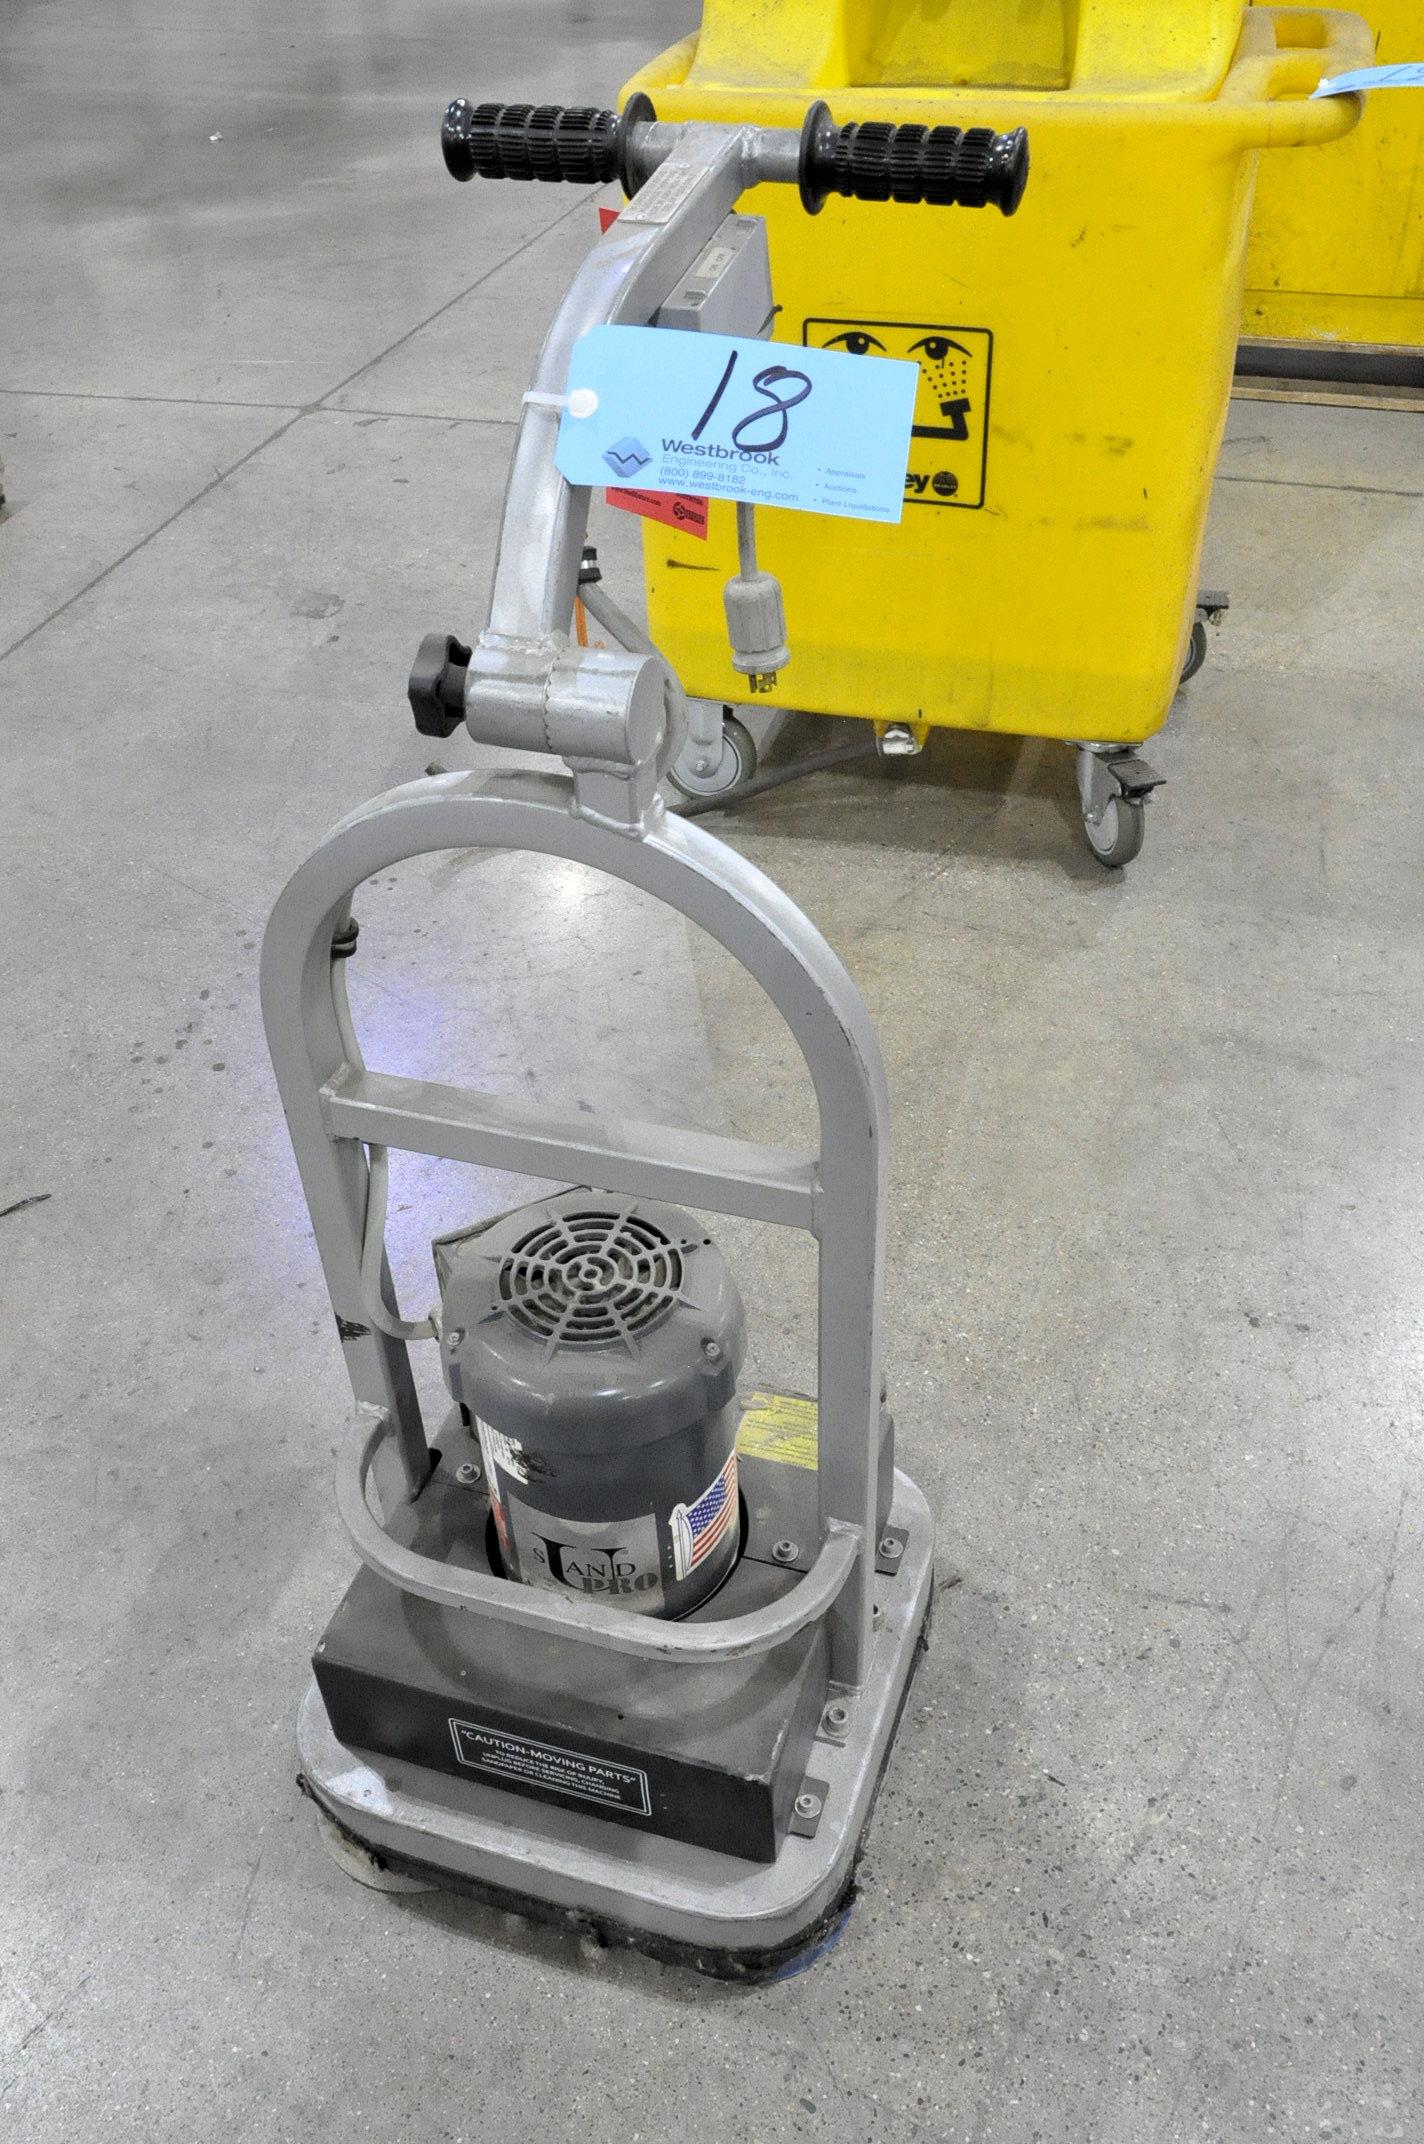 Sand Pro 1 1/2-HP Walk Behind Floor Sander